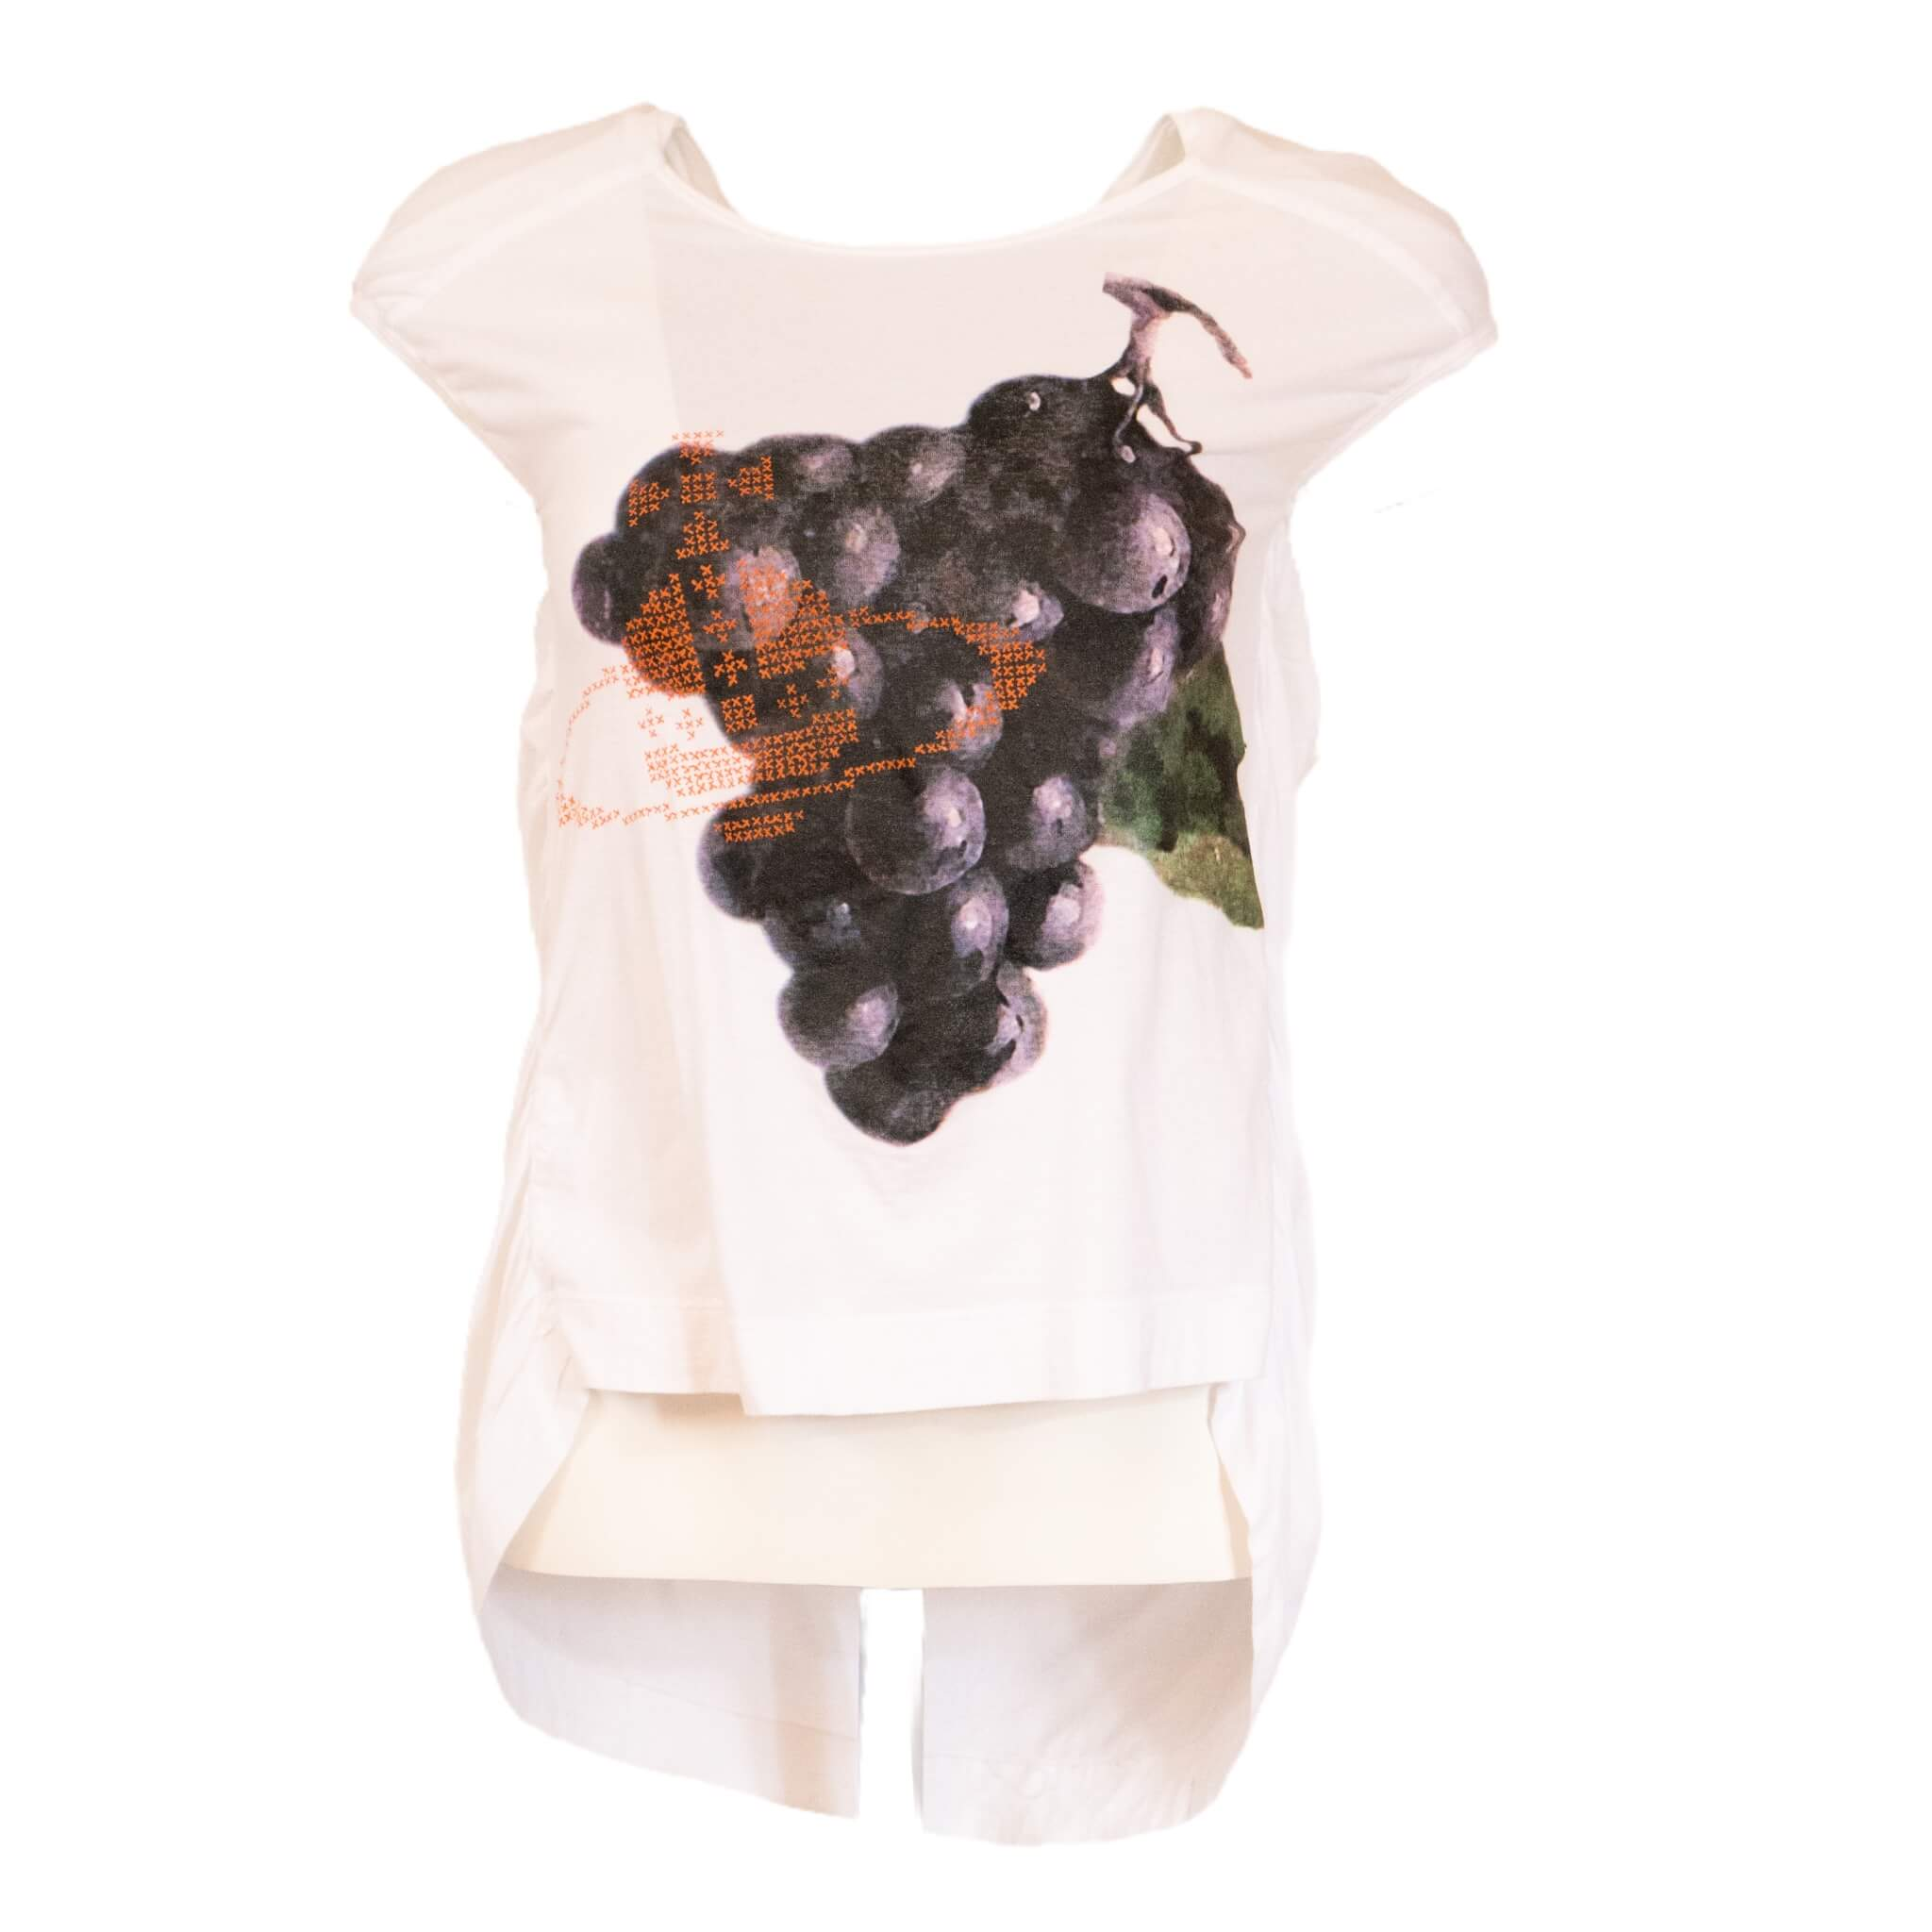 Vivienne Westwood Eat Your Grapes Shirt